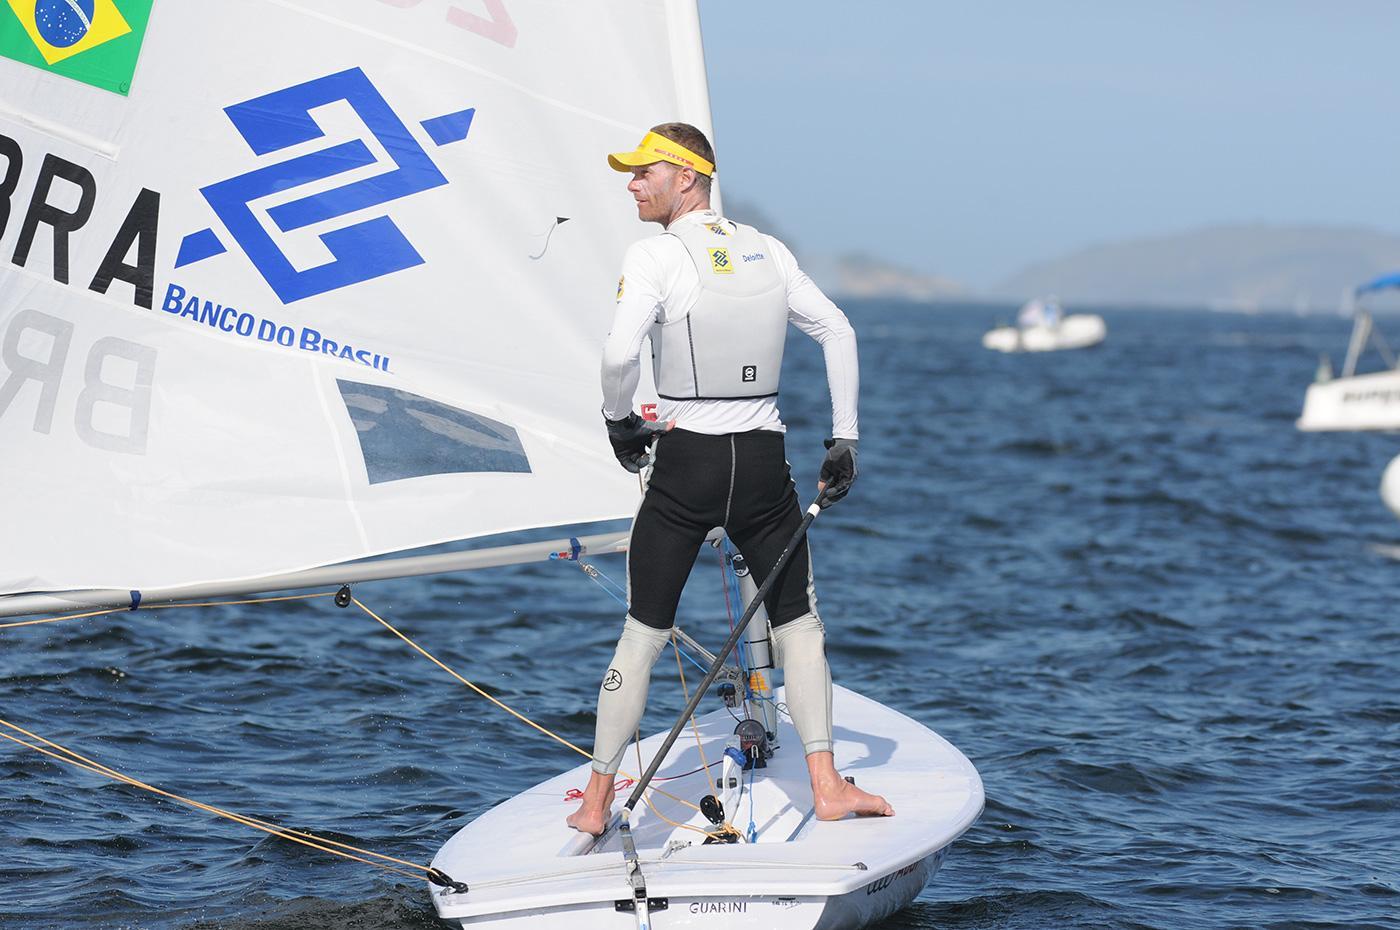 Tokyo 2020 Olympic Sailing Games